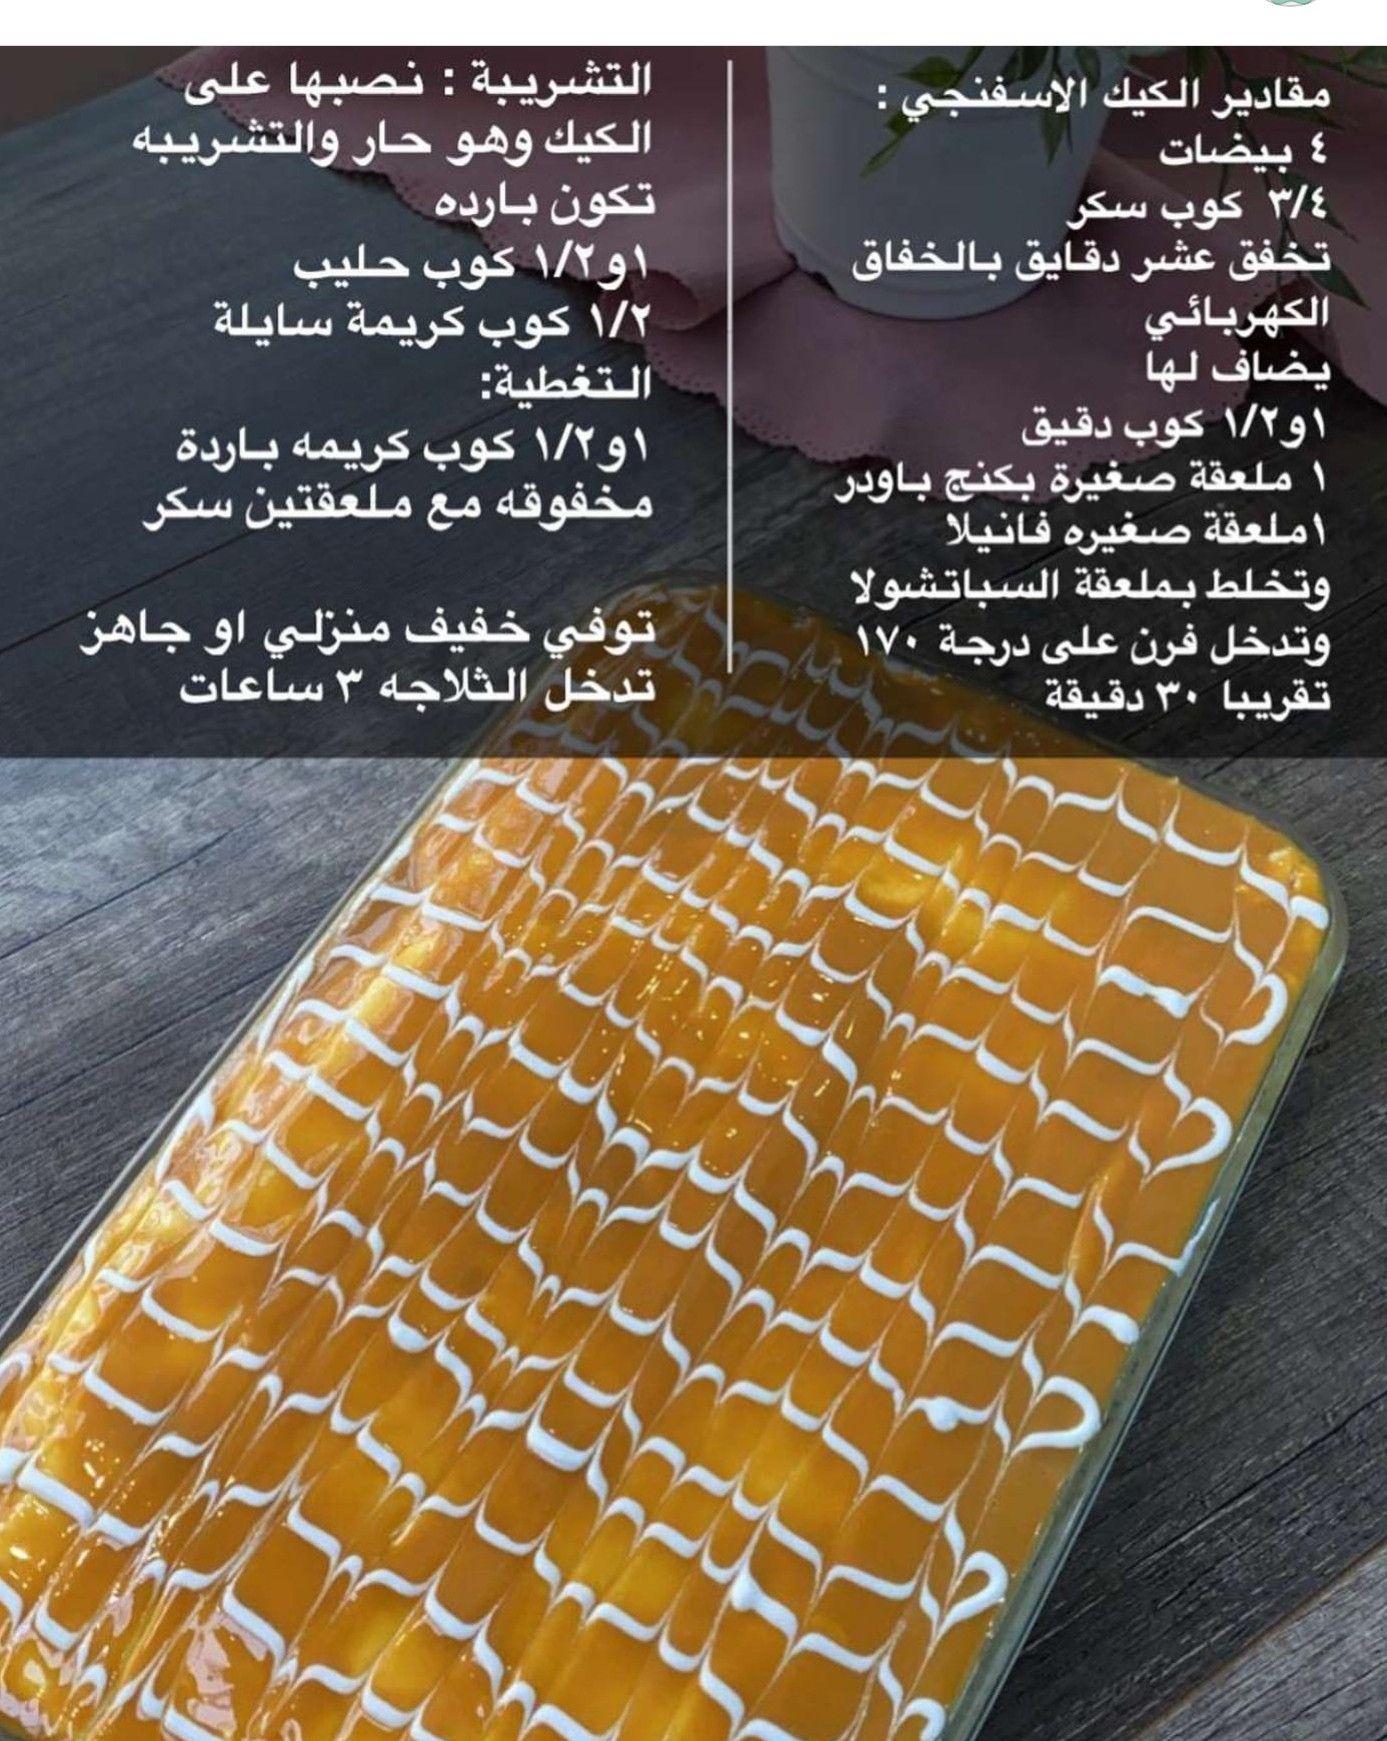 Pin By Sajaah On طبخات Egyptian Food Healty Food Arabic Dessert